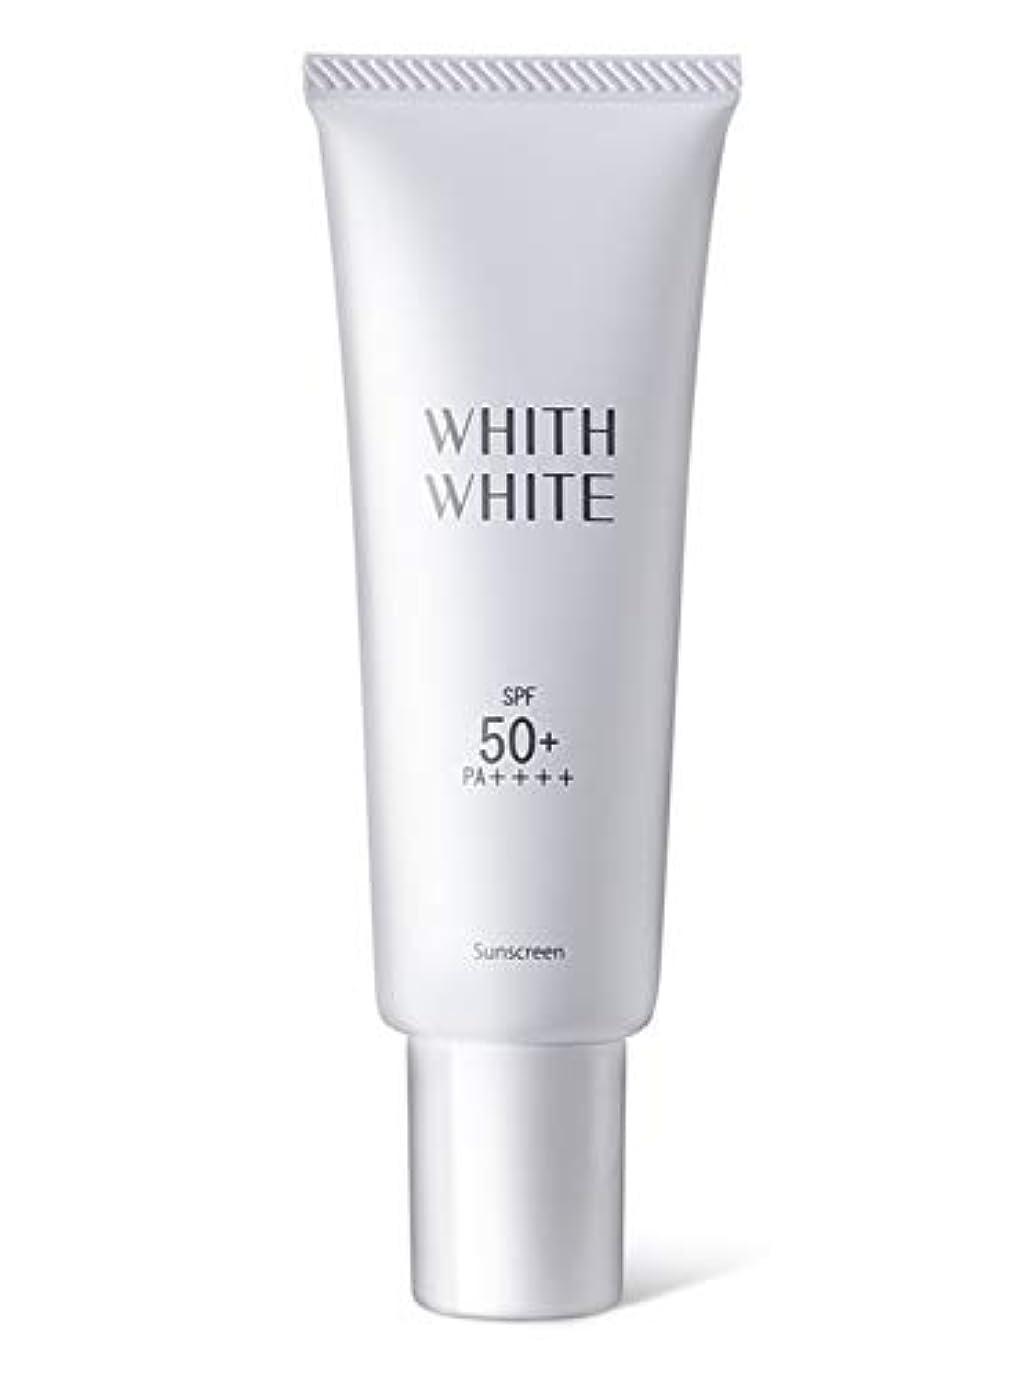 【UVケア SPF50 + PA ++++ 】 フィス ホワイト 日焼け止め クリーム 「 コラーゲン ヒアルロン酸 配合」50g